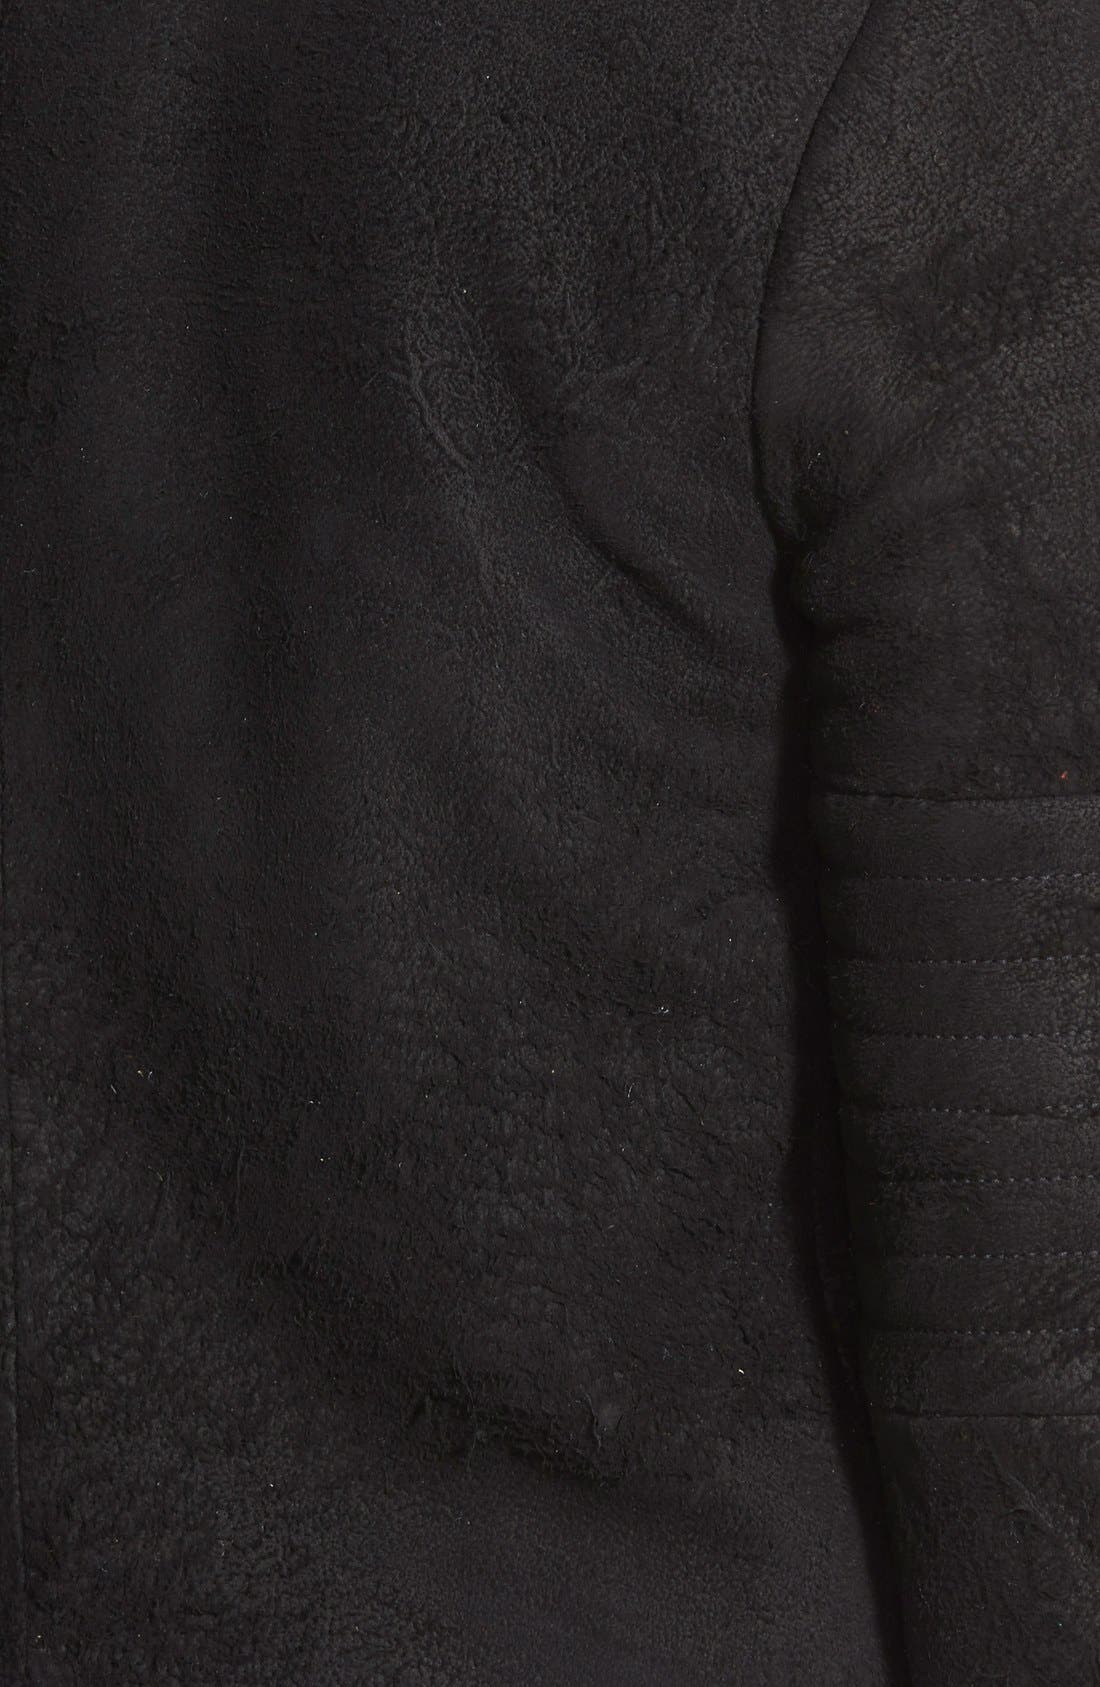 Alternate Image 3  - J Brand Ready-To-Wear 'Aiah' Lambskin Suede Moto Jacket (Nordstrom Exclusive)